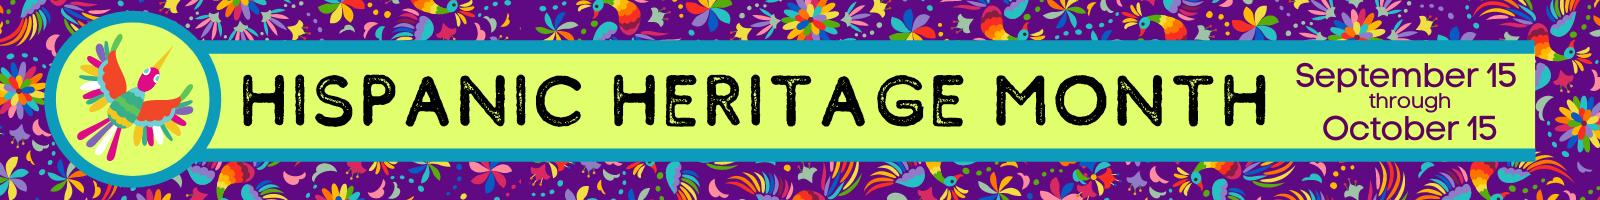 Hispanic Heritage Month September 15 to October 15